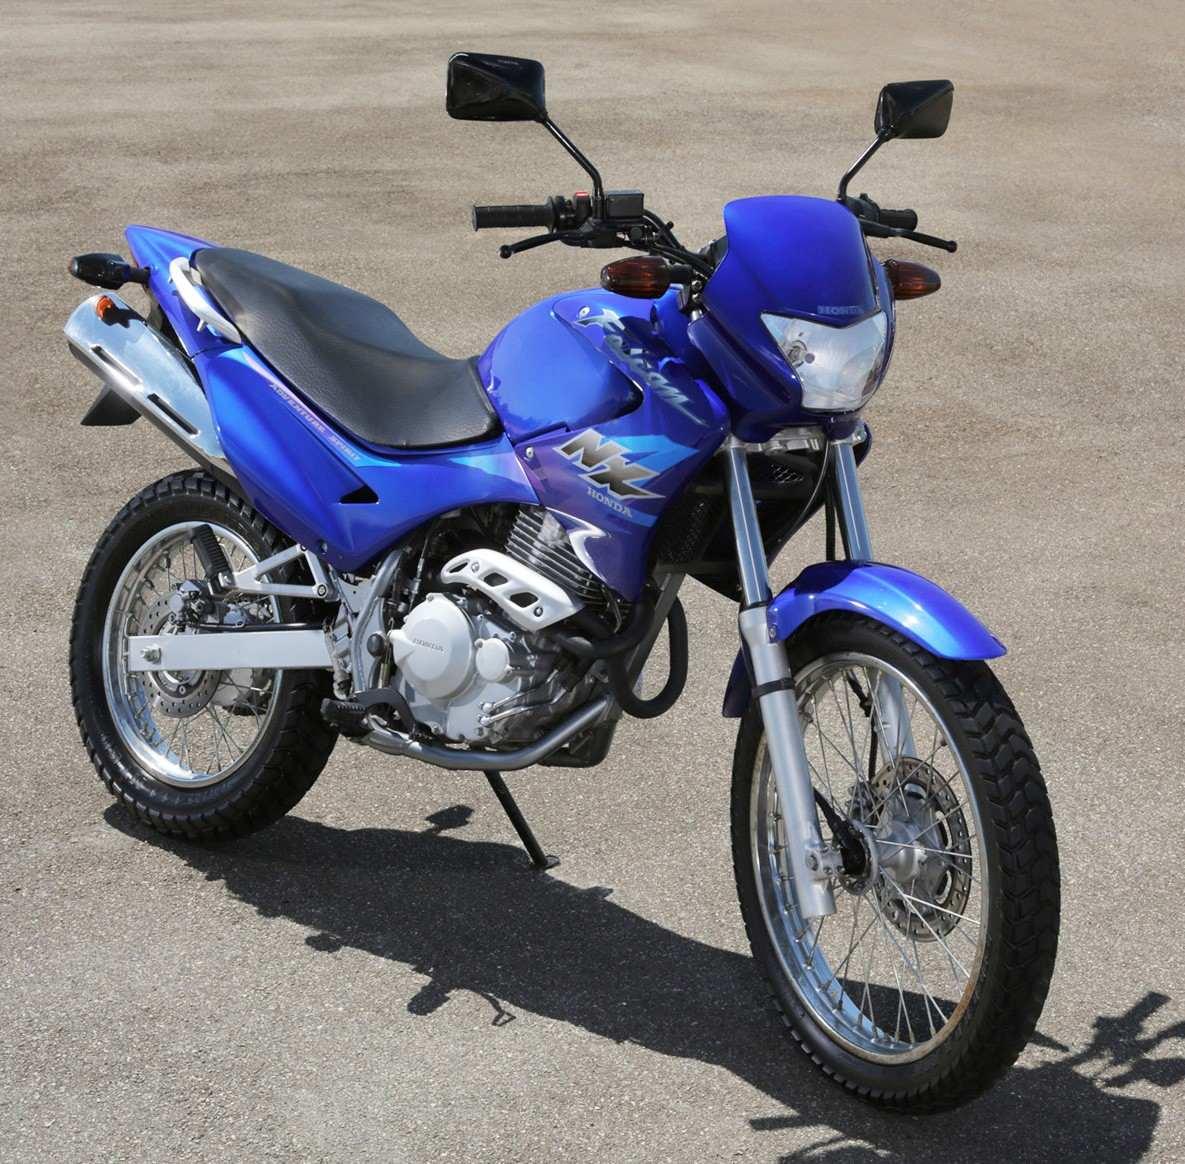 79c9b618c2bb5 Retificador Regulador Voltagem Honda Nx4 Falcon 2000 A 2008 - R  68 ...